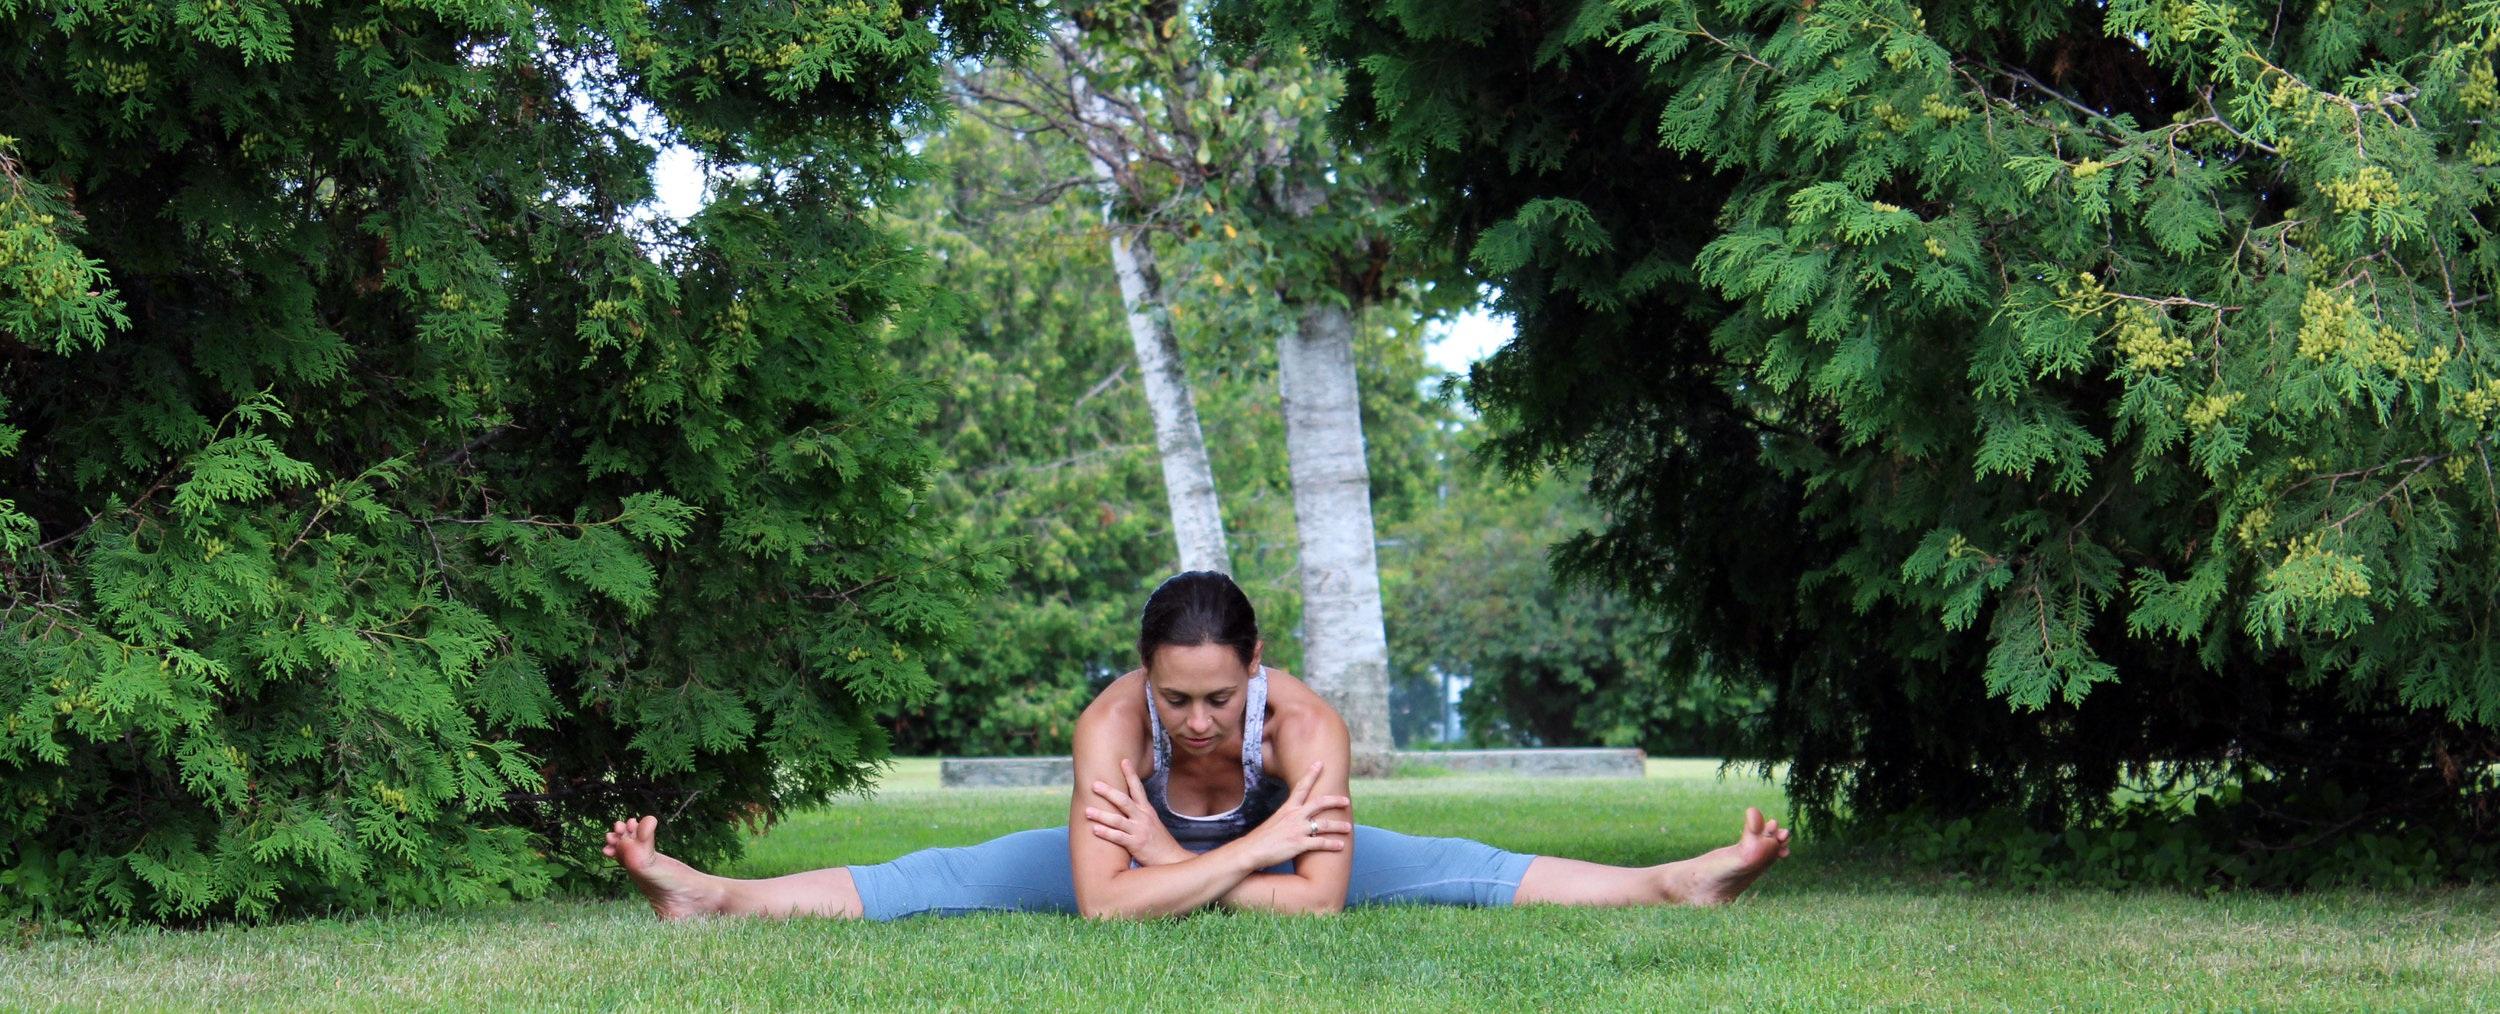 shayna-forrest-yoga.jpg